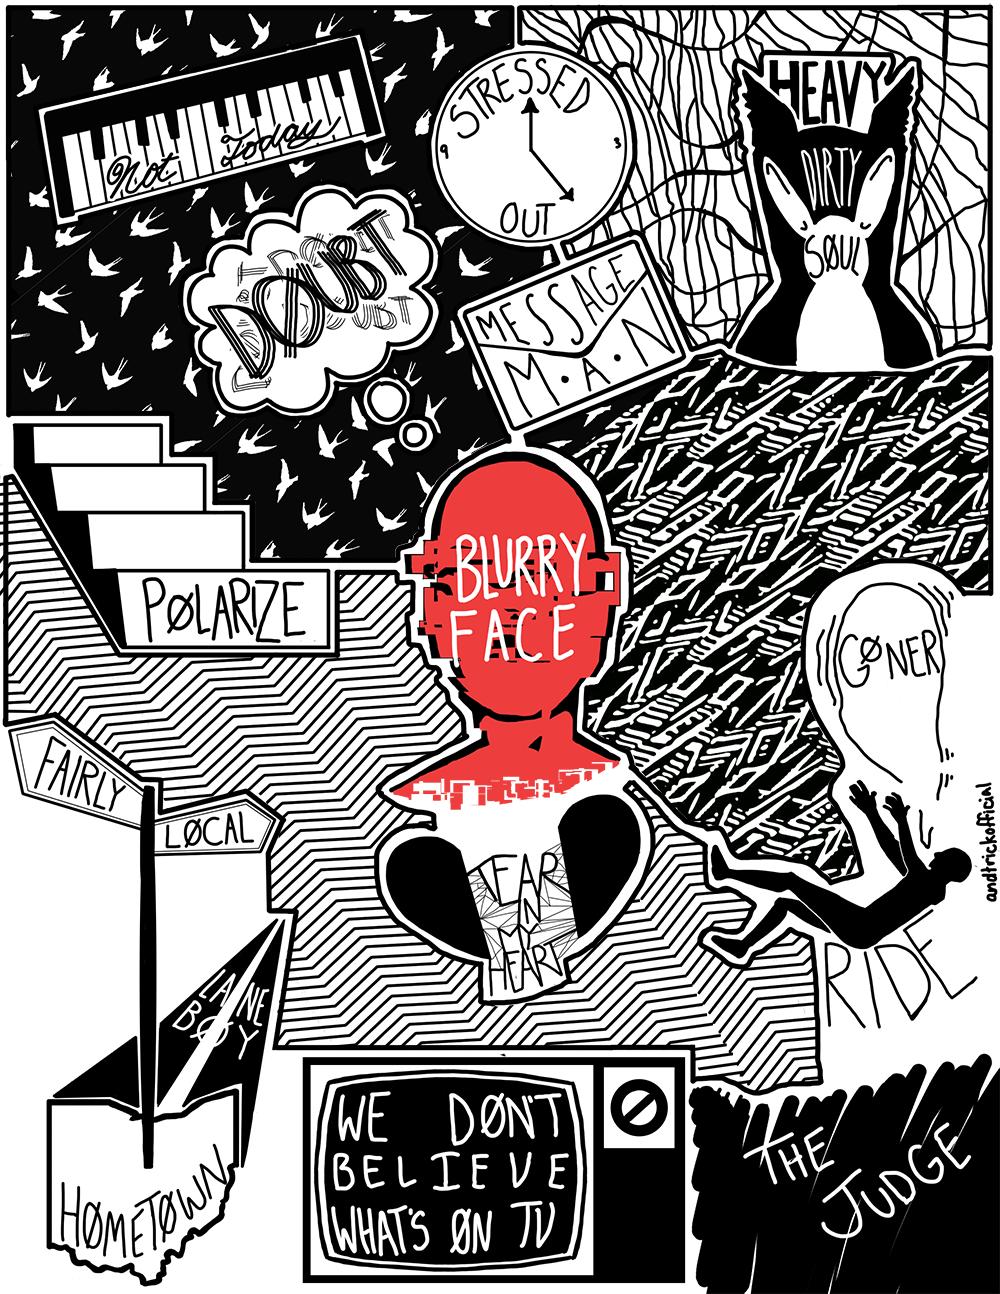 Kitchen Sink Twenty One Pilots Album twenty one pilots | blurryface | tunes | pinterest | pilot, album